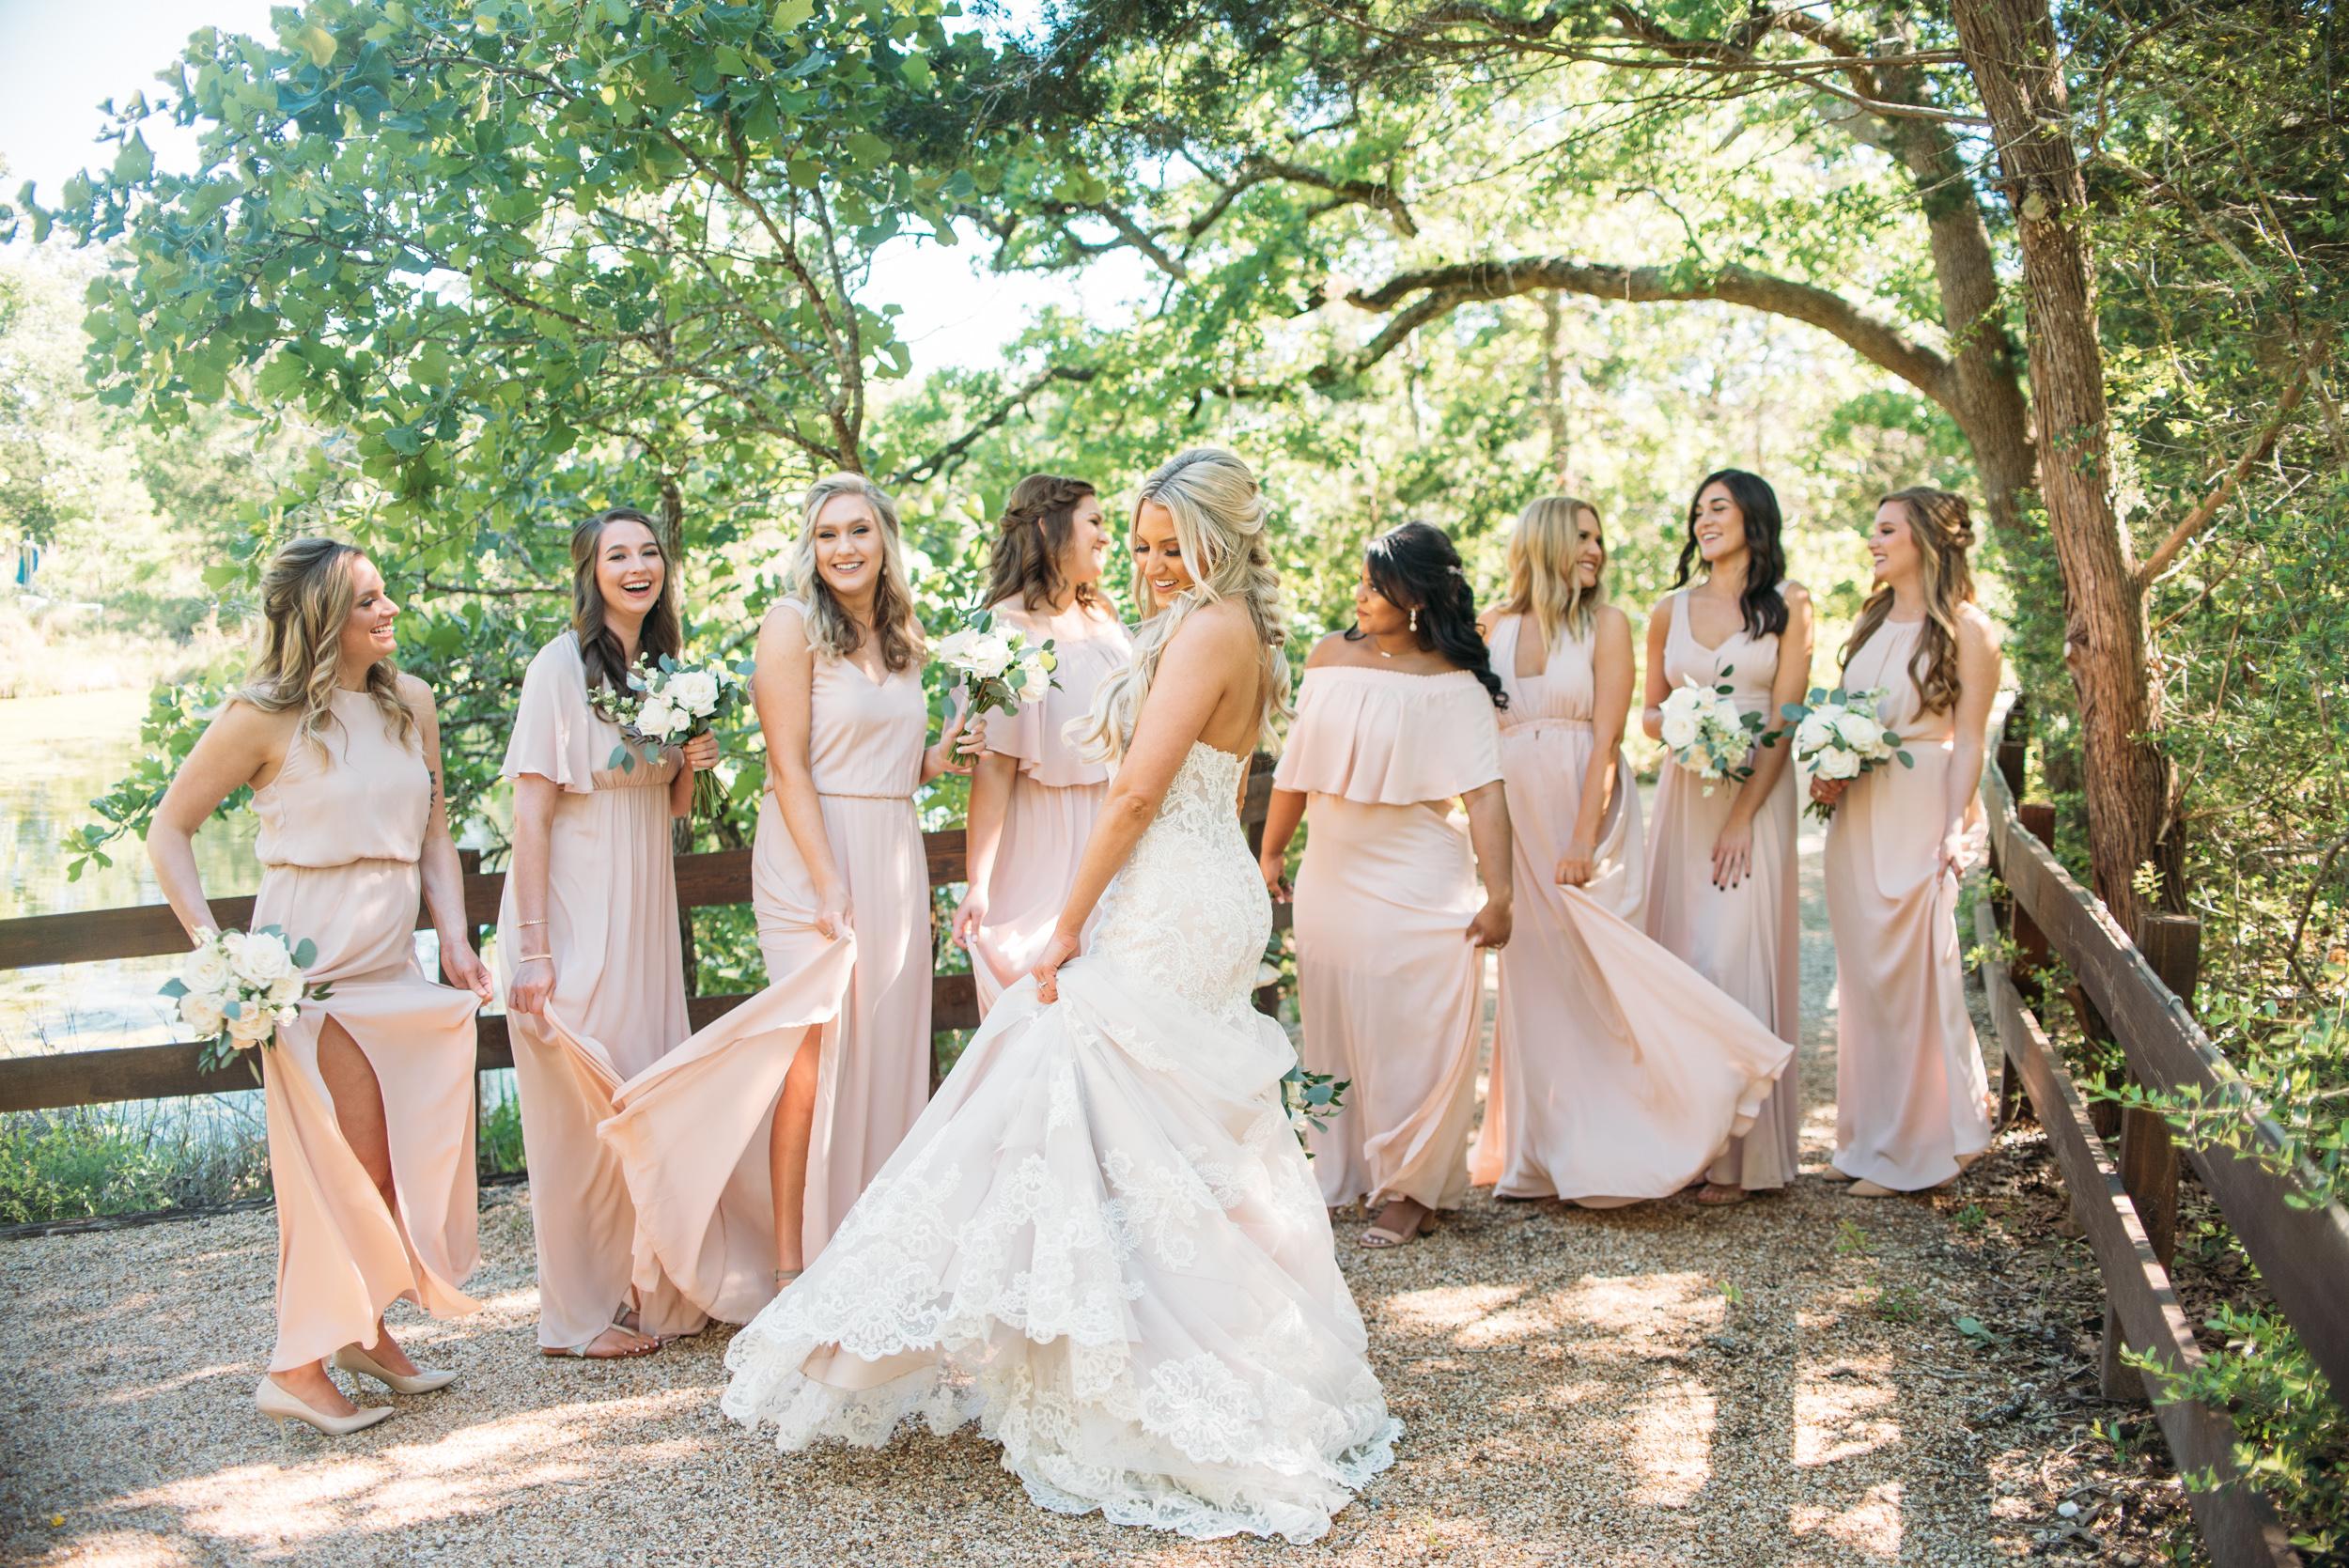 Blush mismatched bridesmaids dresses peach creek ranch college station austin wedding coordinator photographer san angel